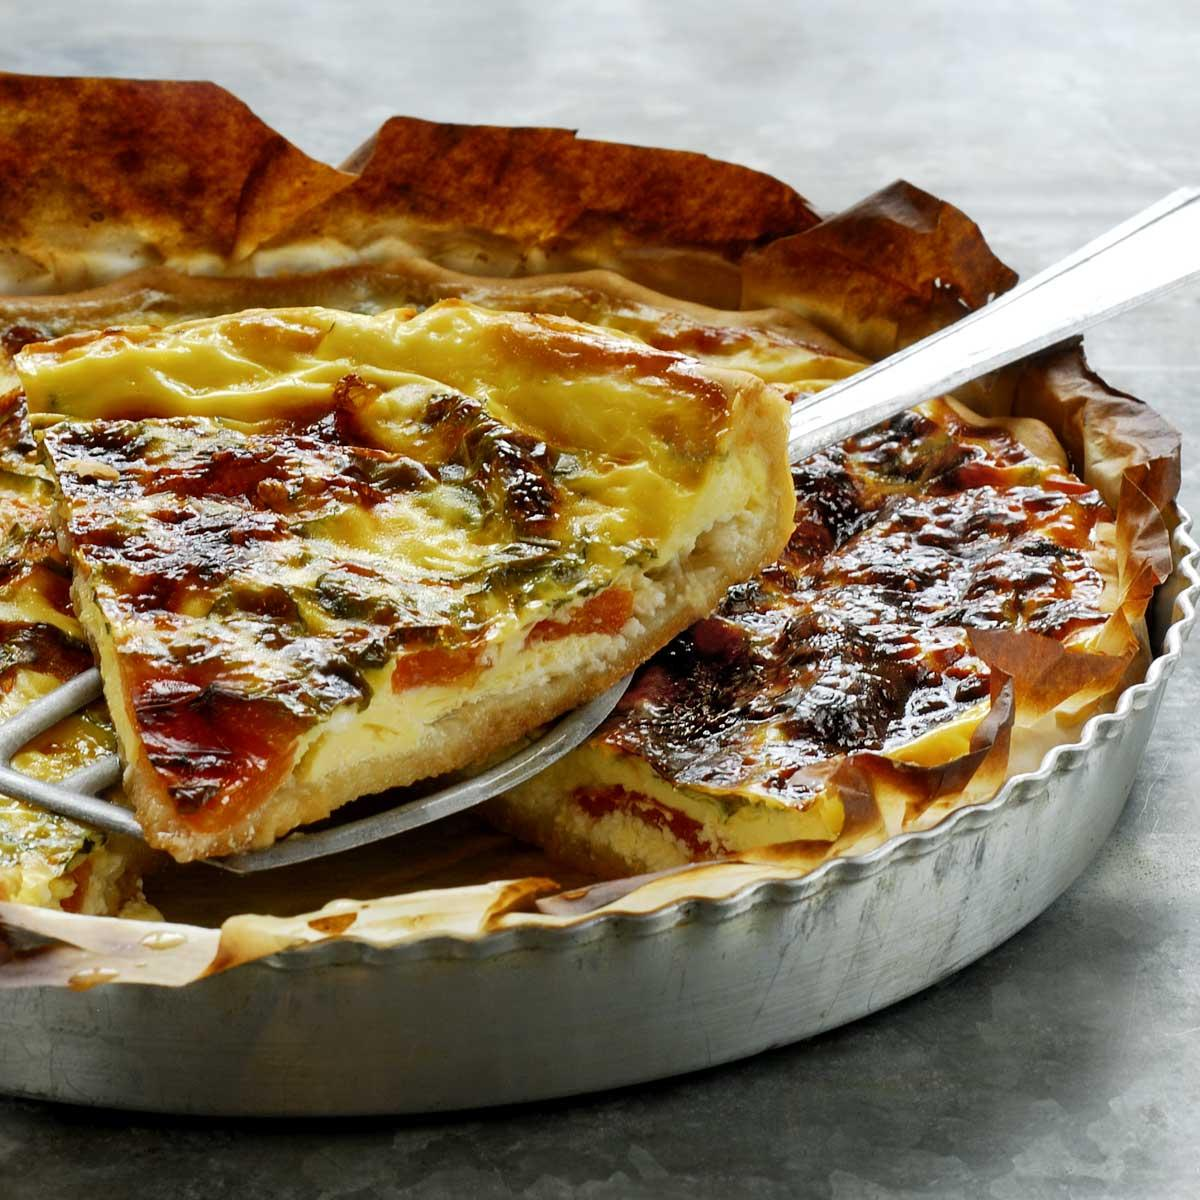 Recette quiche lorraine (sans lait) - Cuisine / Madame Figaro